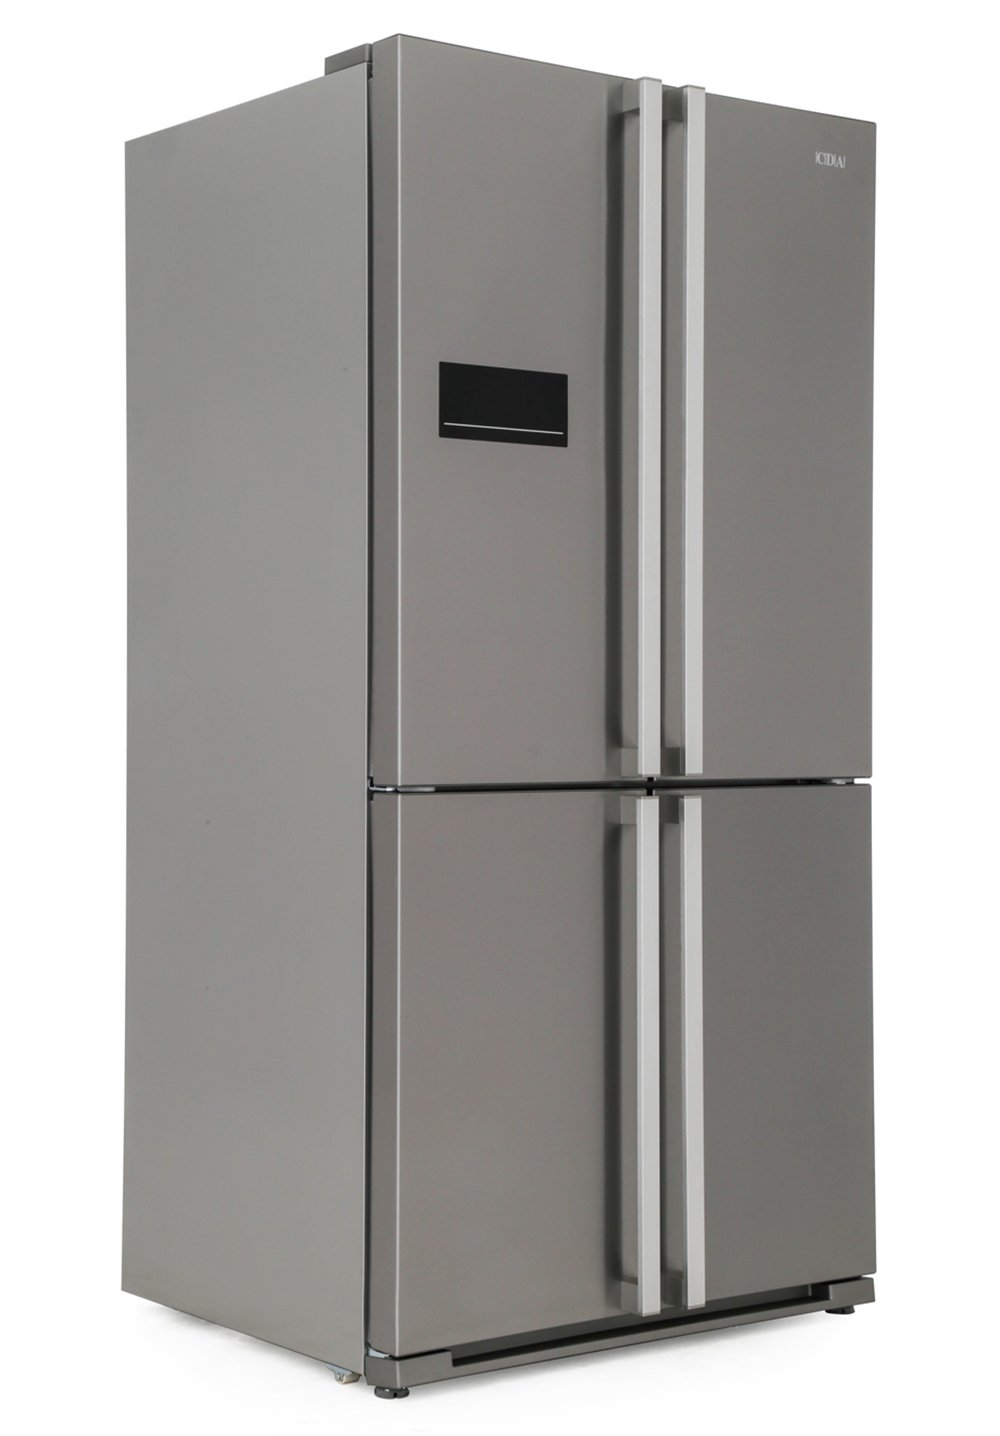 CDA PC900SS American Fridge Freezer